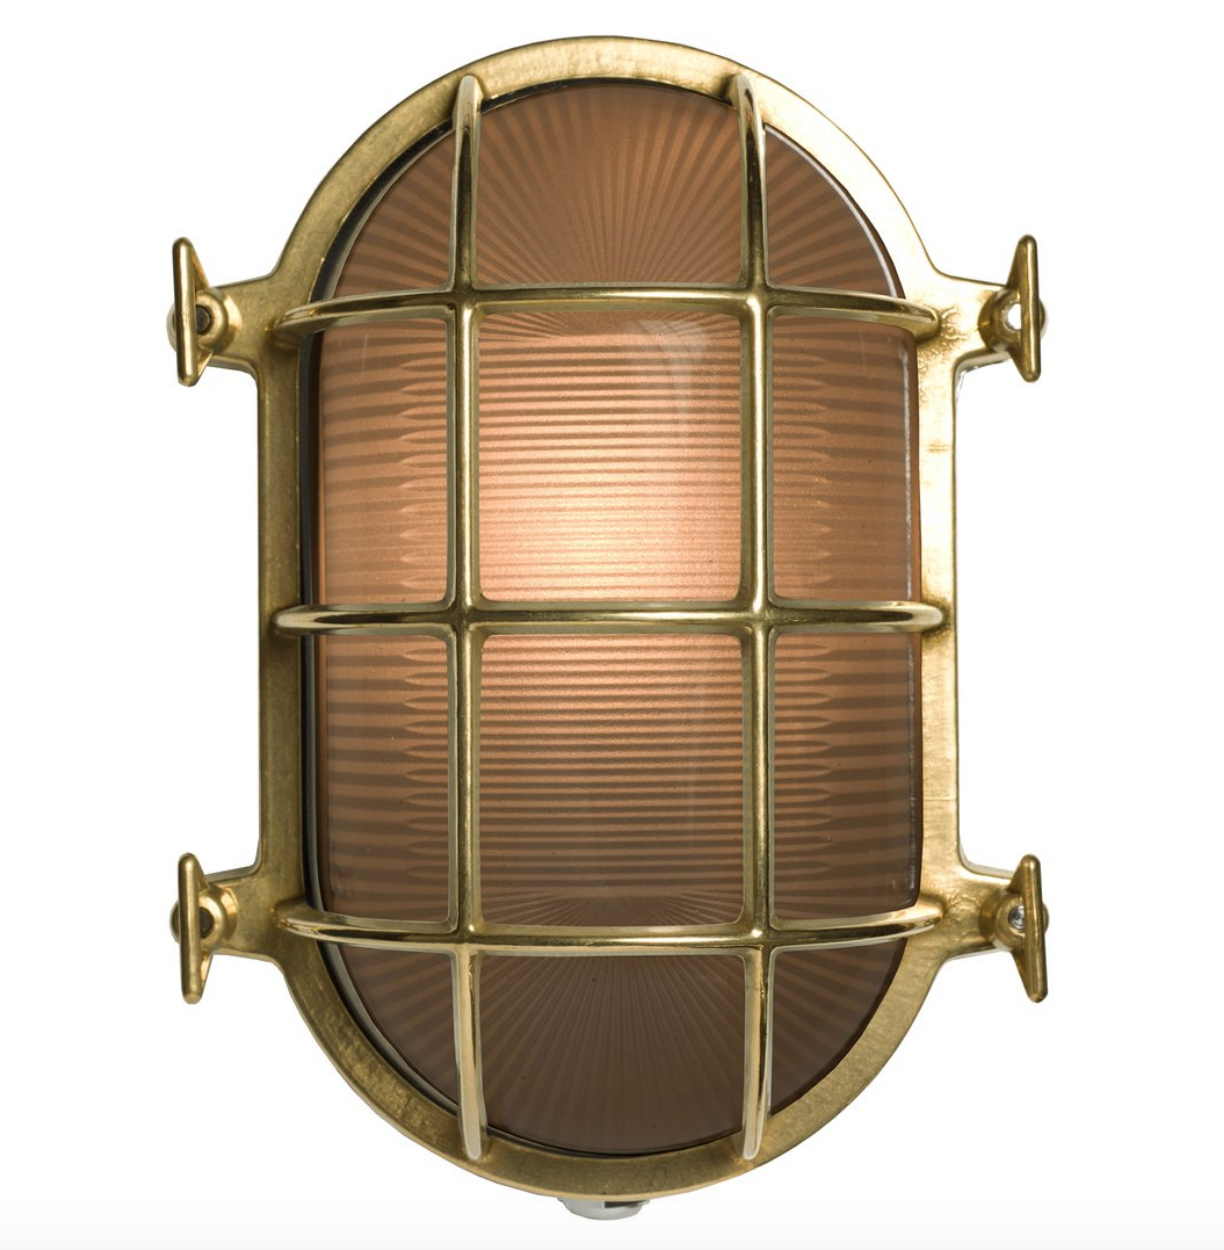 Oval Brass Bulkhead Light